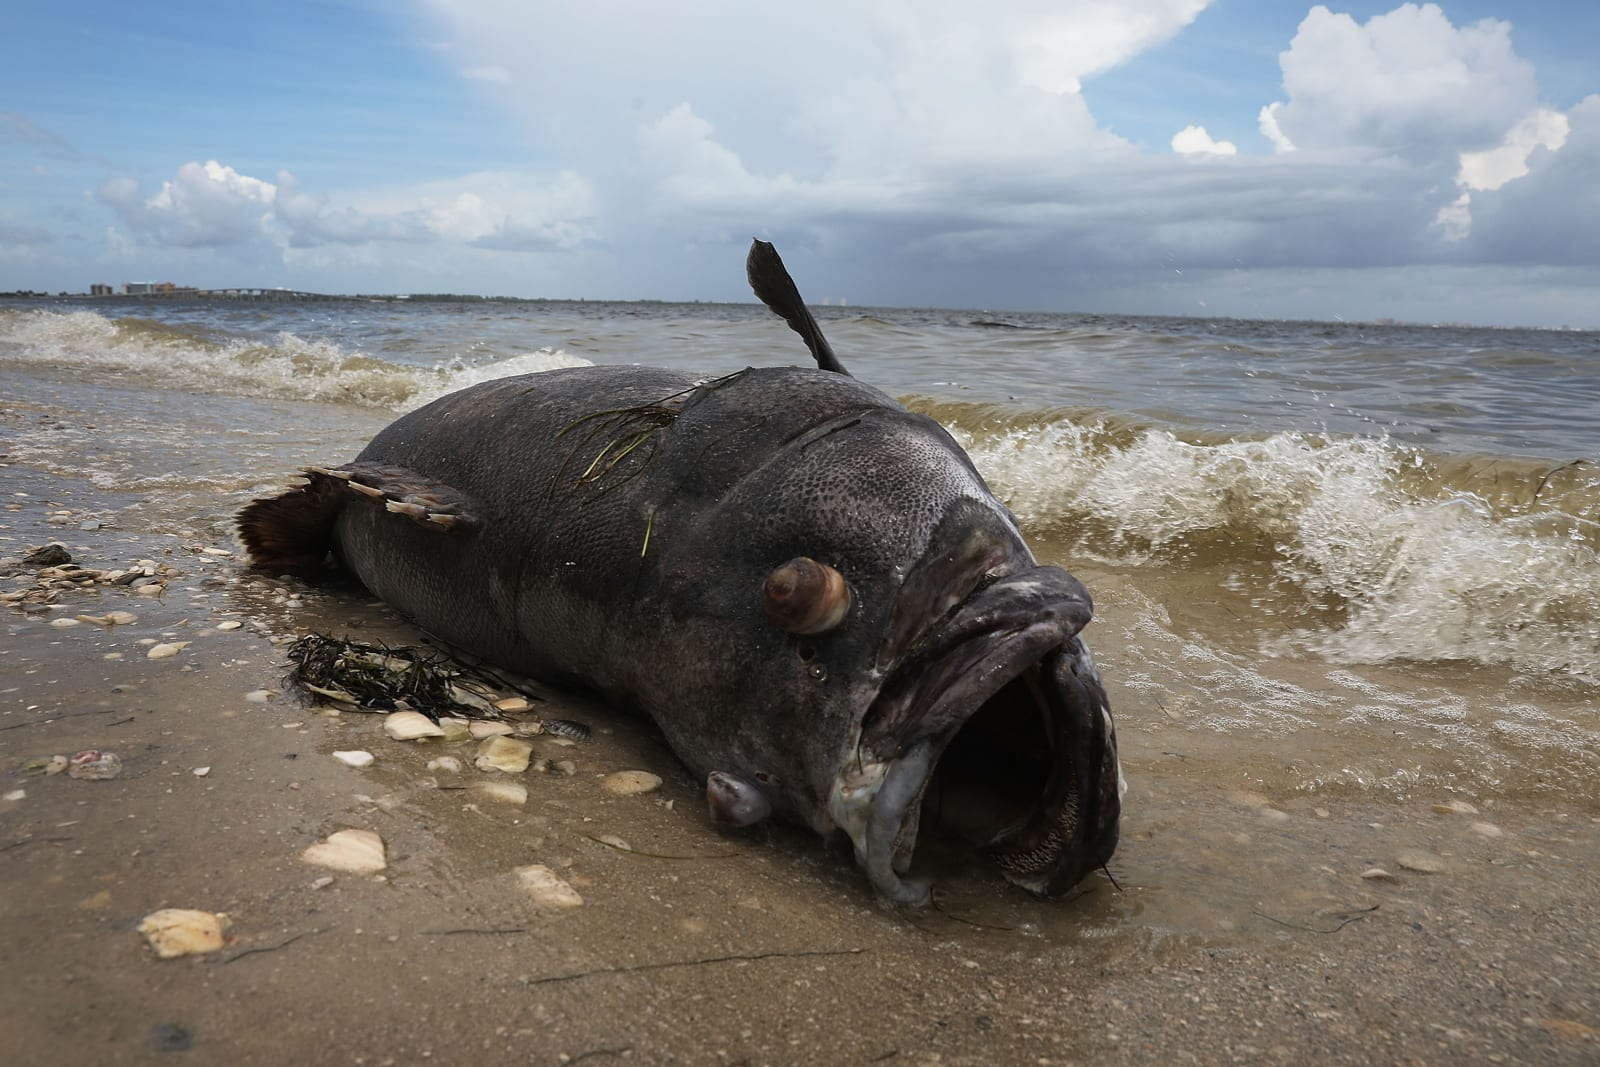 Toxic Red Tide On Florida's Southwest Coast Killing Hundreds Of Turtles And Fish